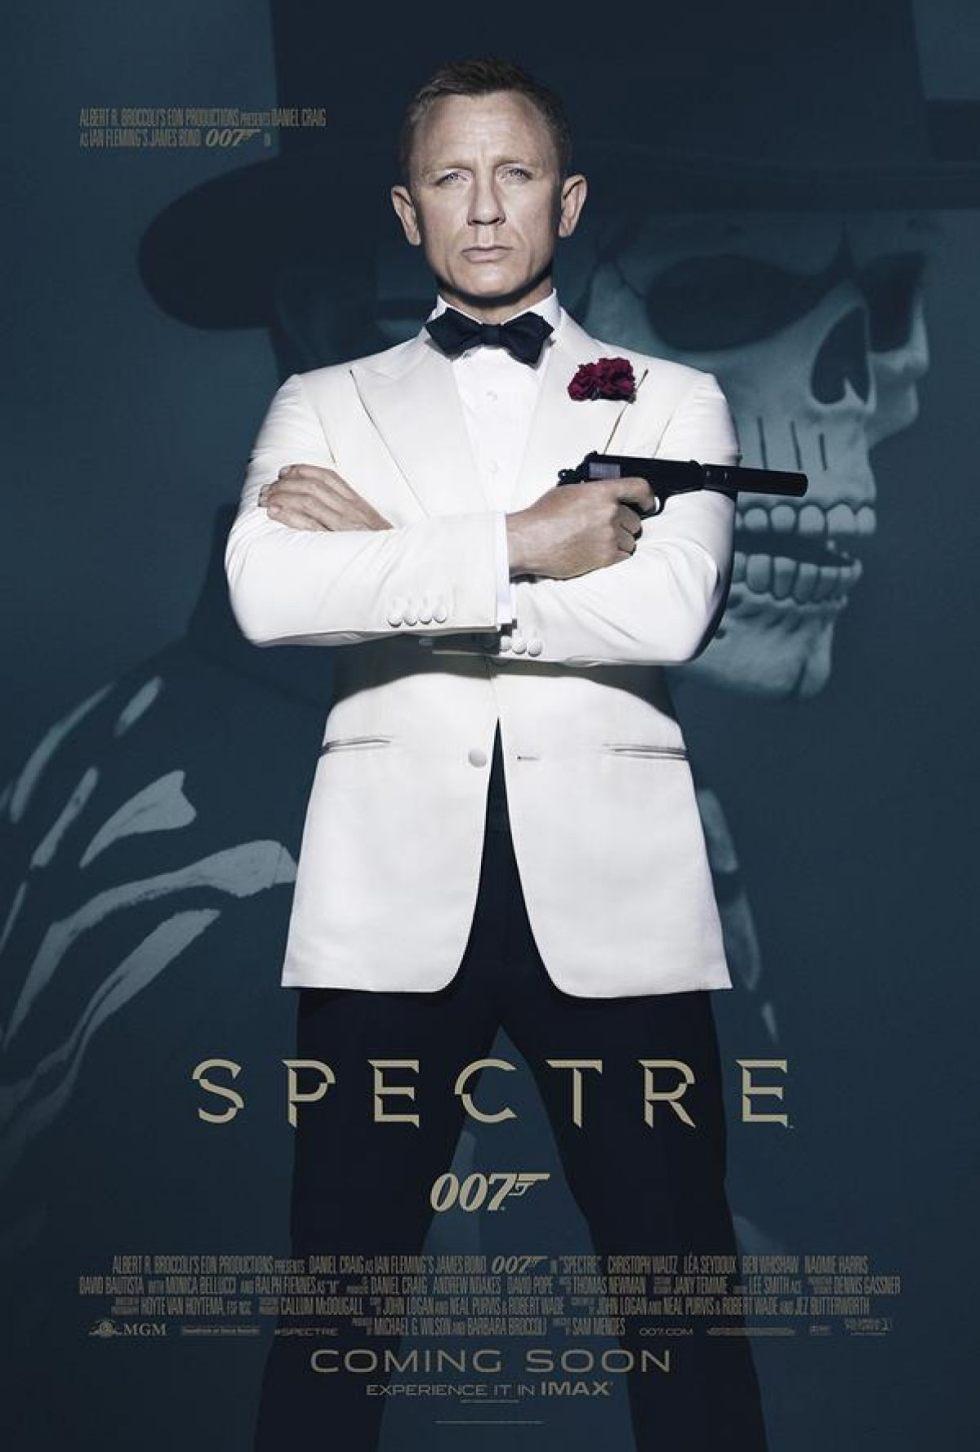 spectre-poster-02